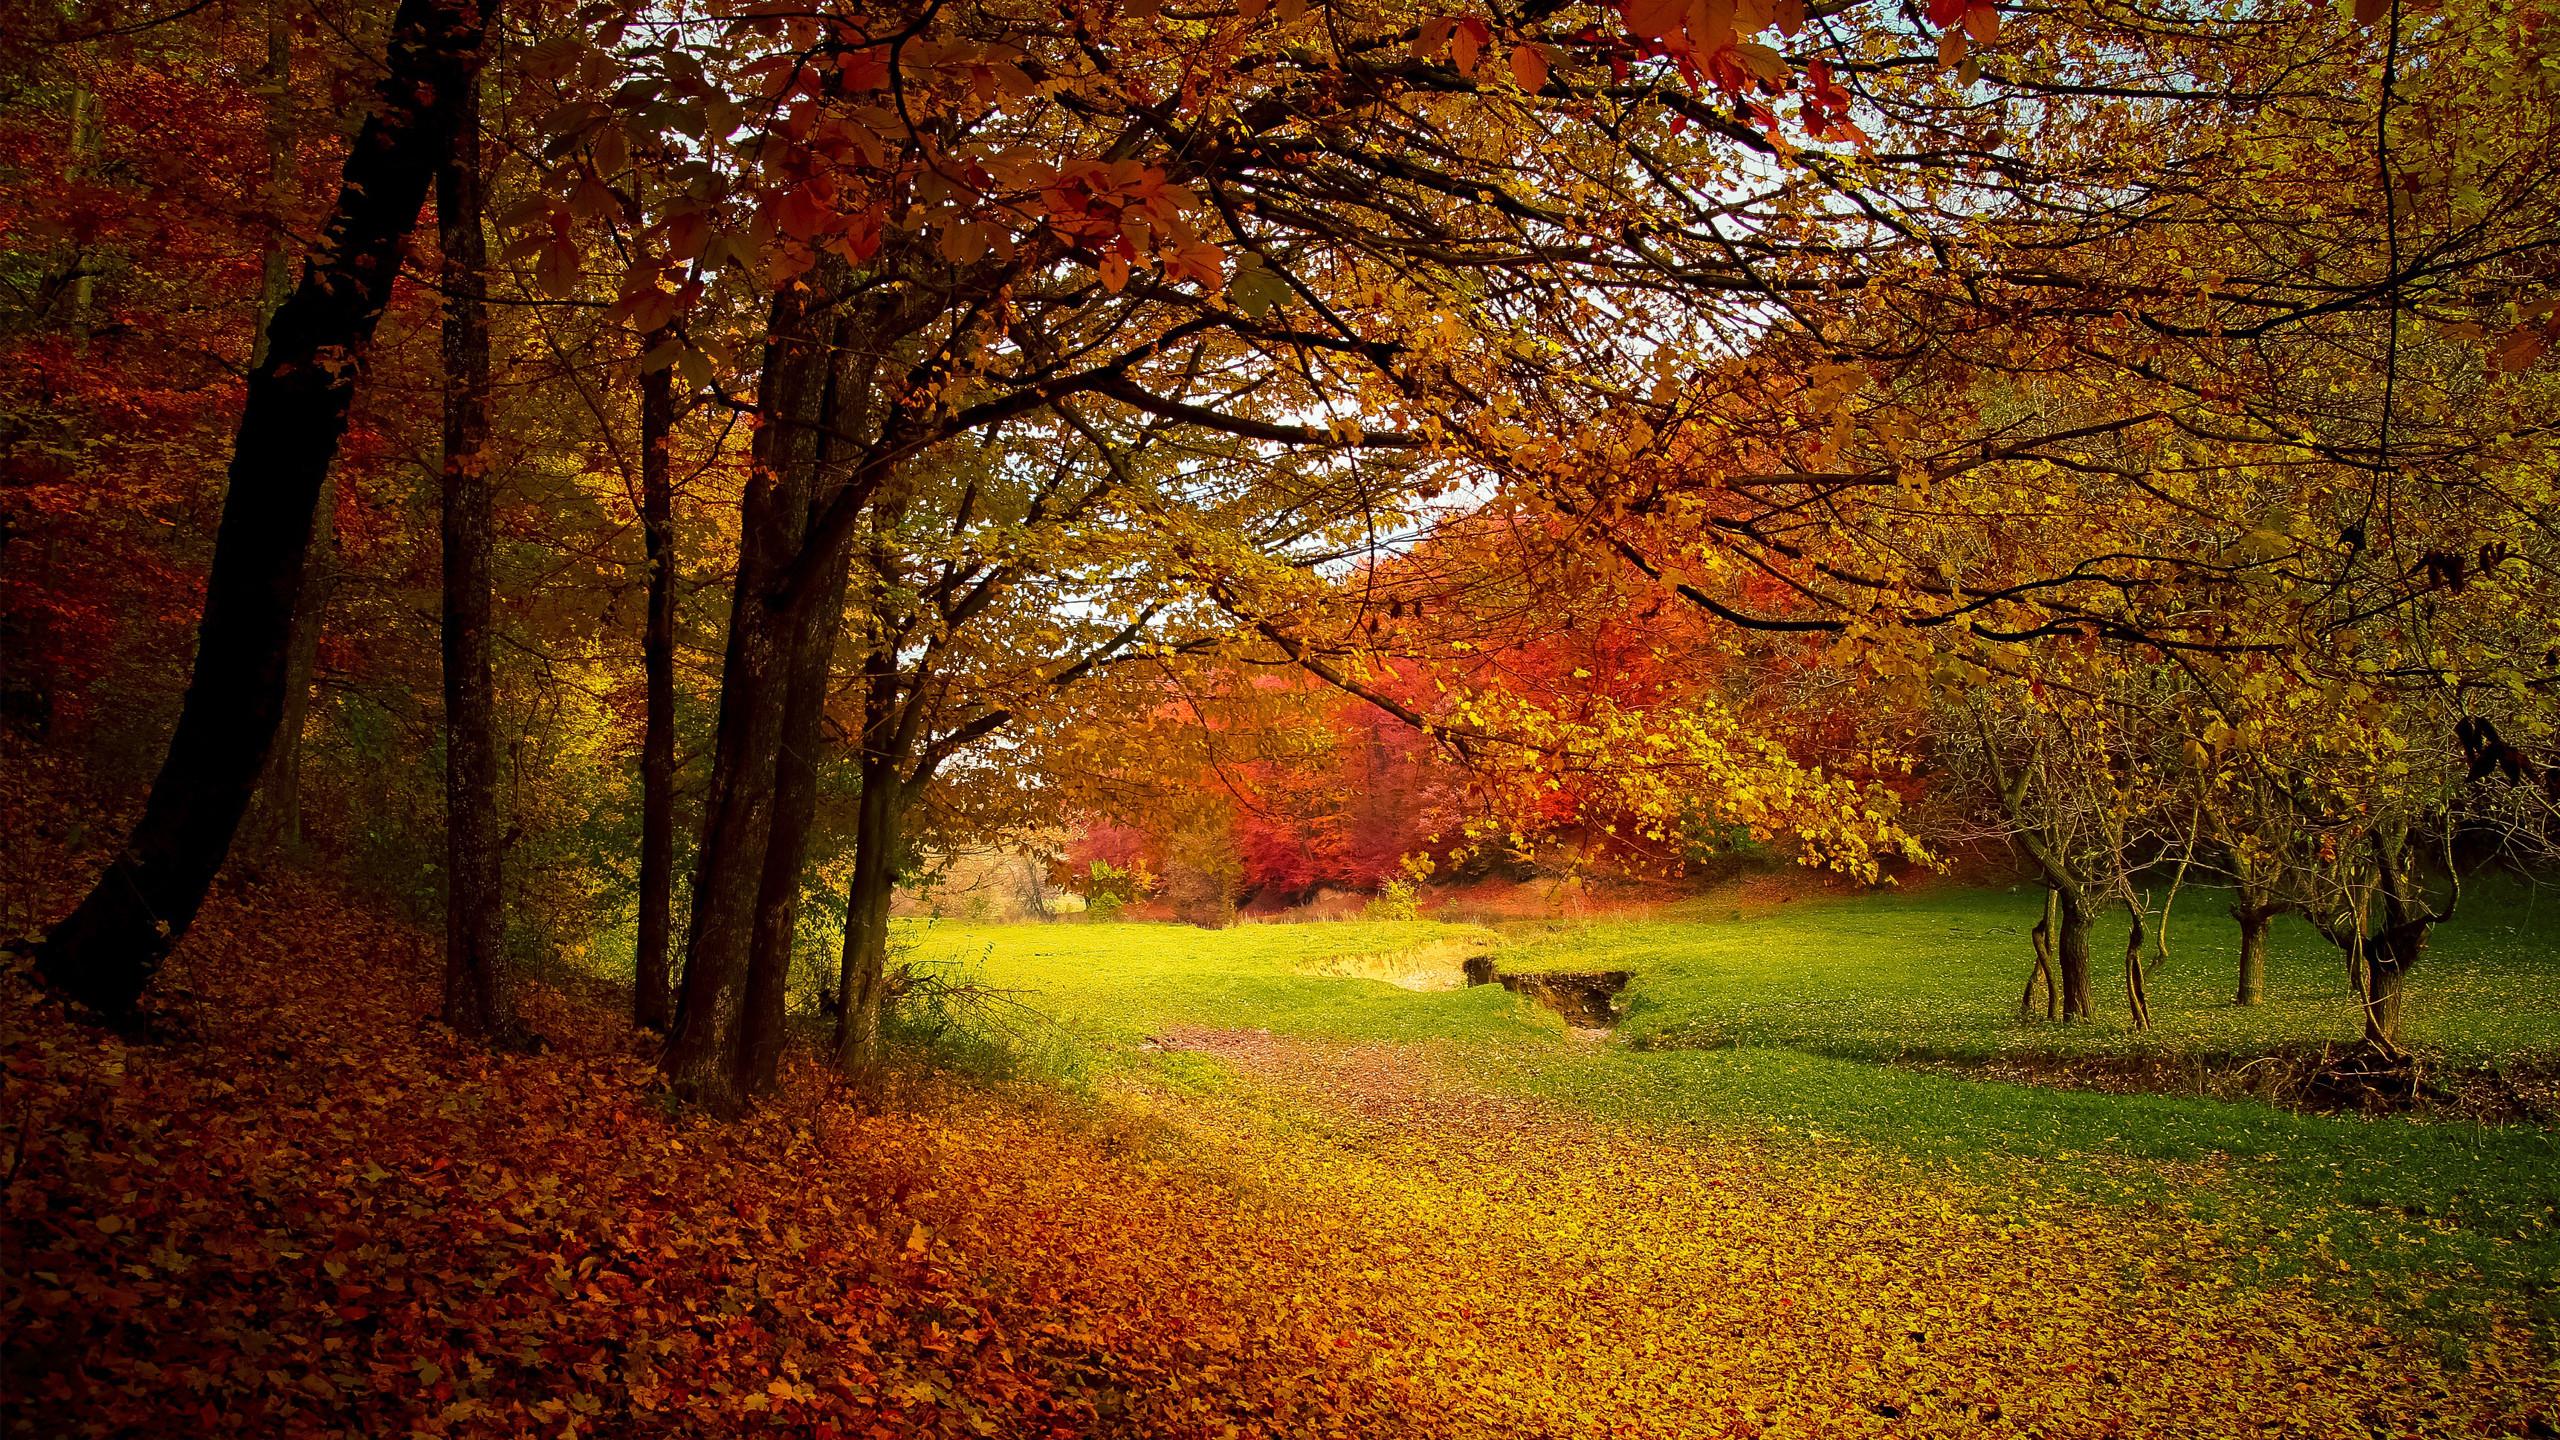 Colorful Autumn Season Wallpaper Free Download HD Wallpapers